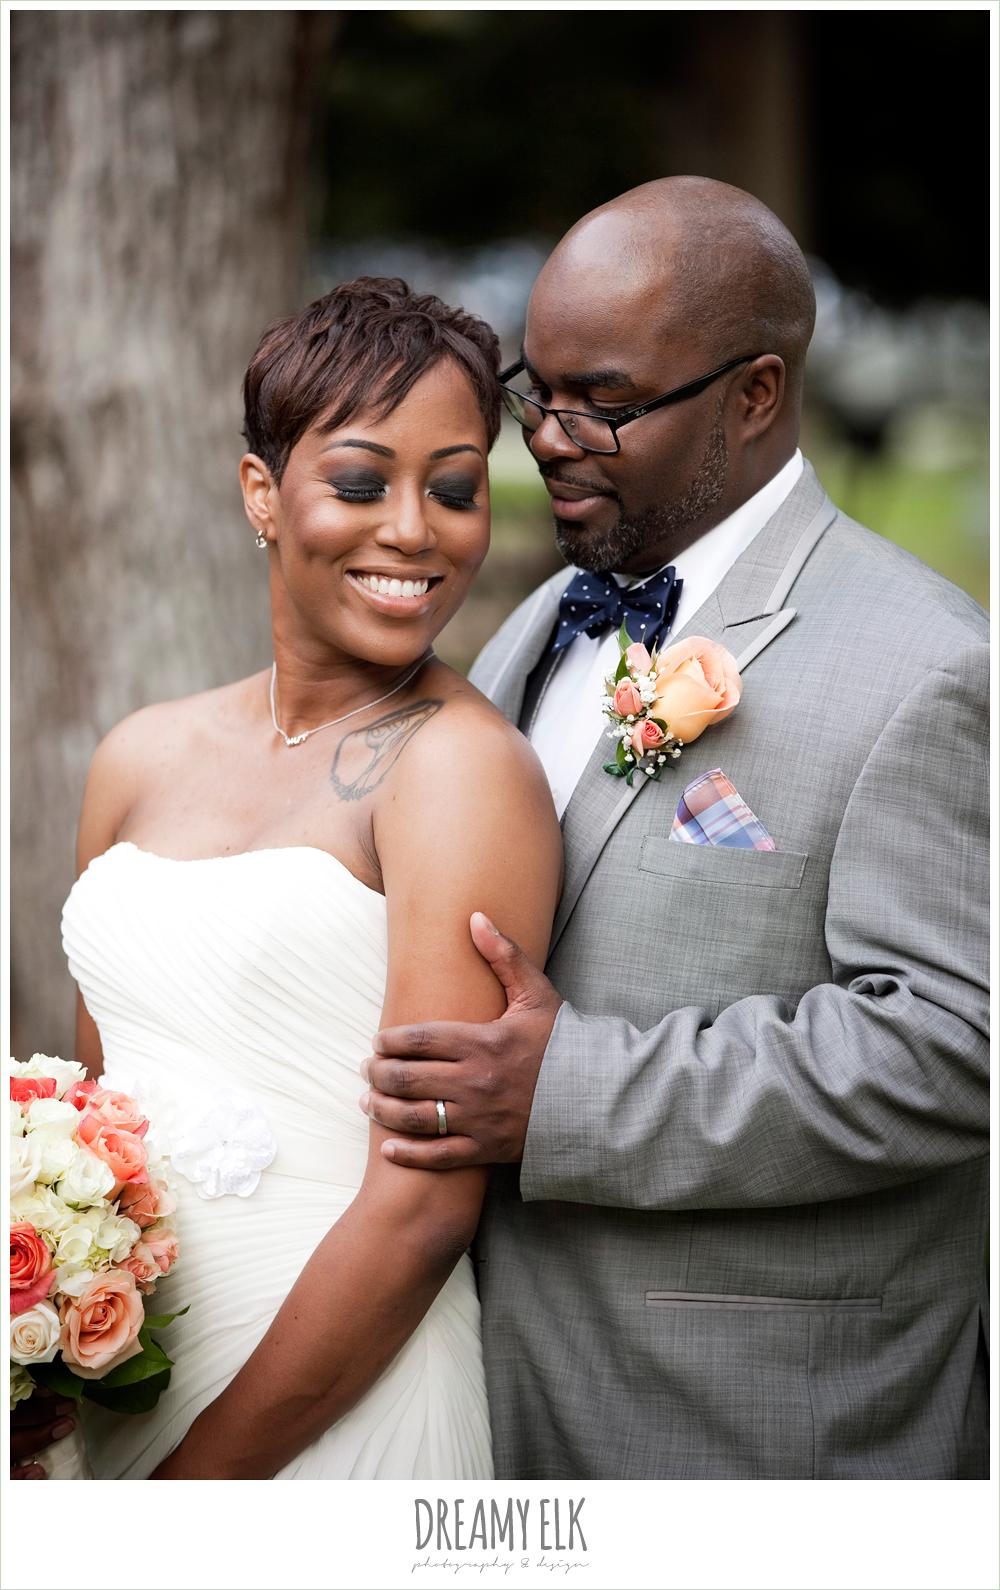 bre'onna & tyrone, the wedding photo contest